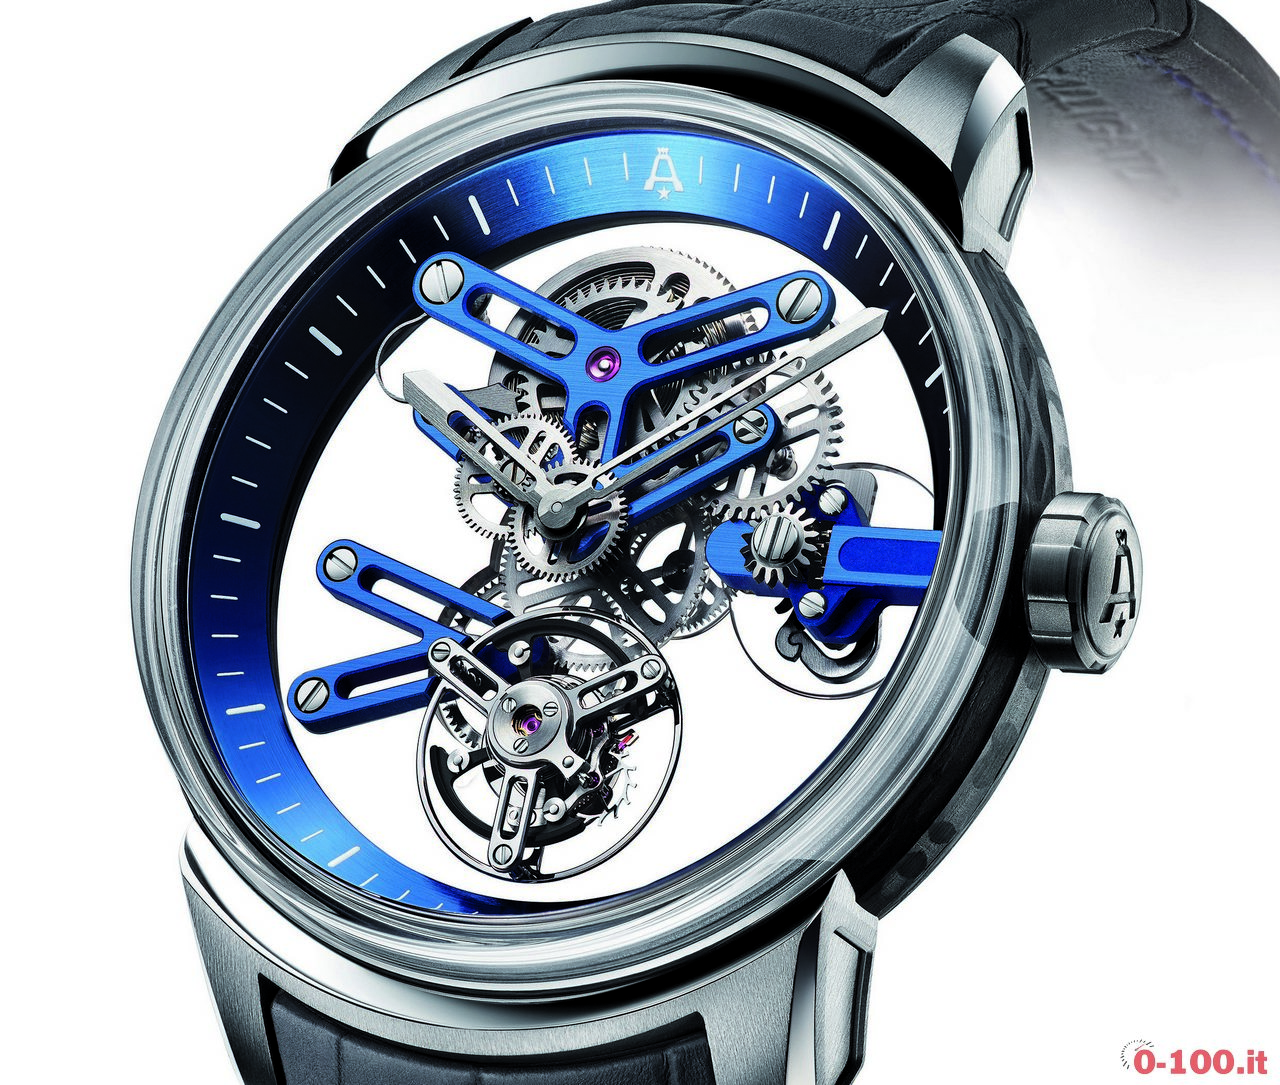 baselworld-2017-angelus-u20-ultra-skeleton-tourbillon-limited-edition-prezzo-price_0-1001